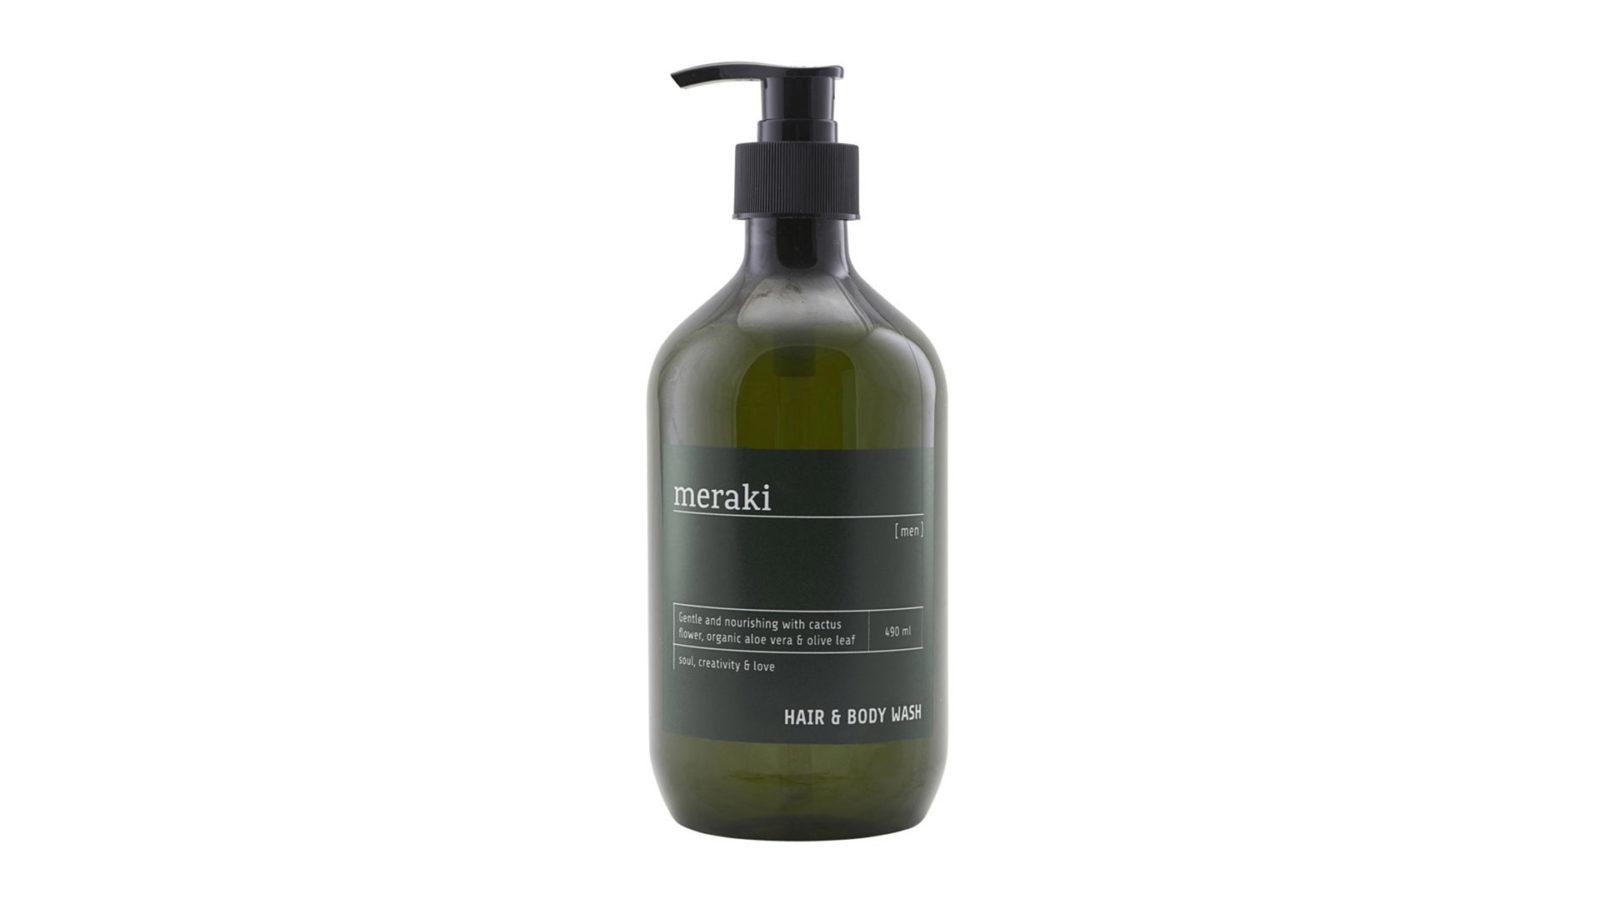 meraki-hair-&-body-wash